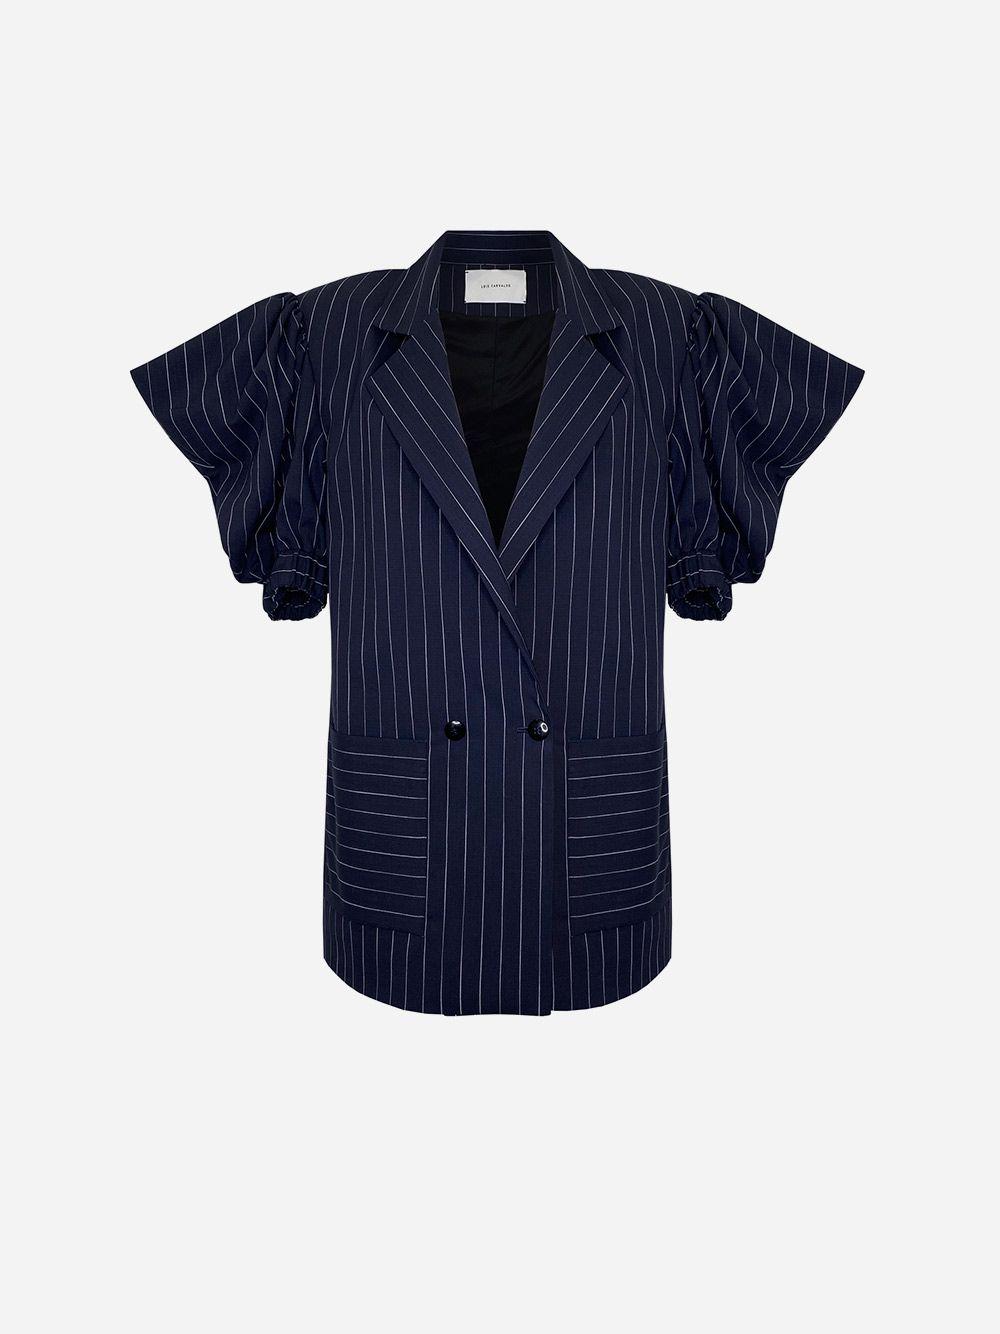 Oversize Blazer with Short Draped Sleeves